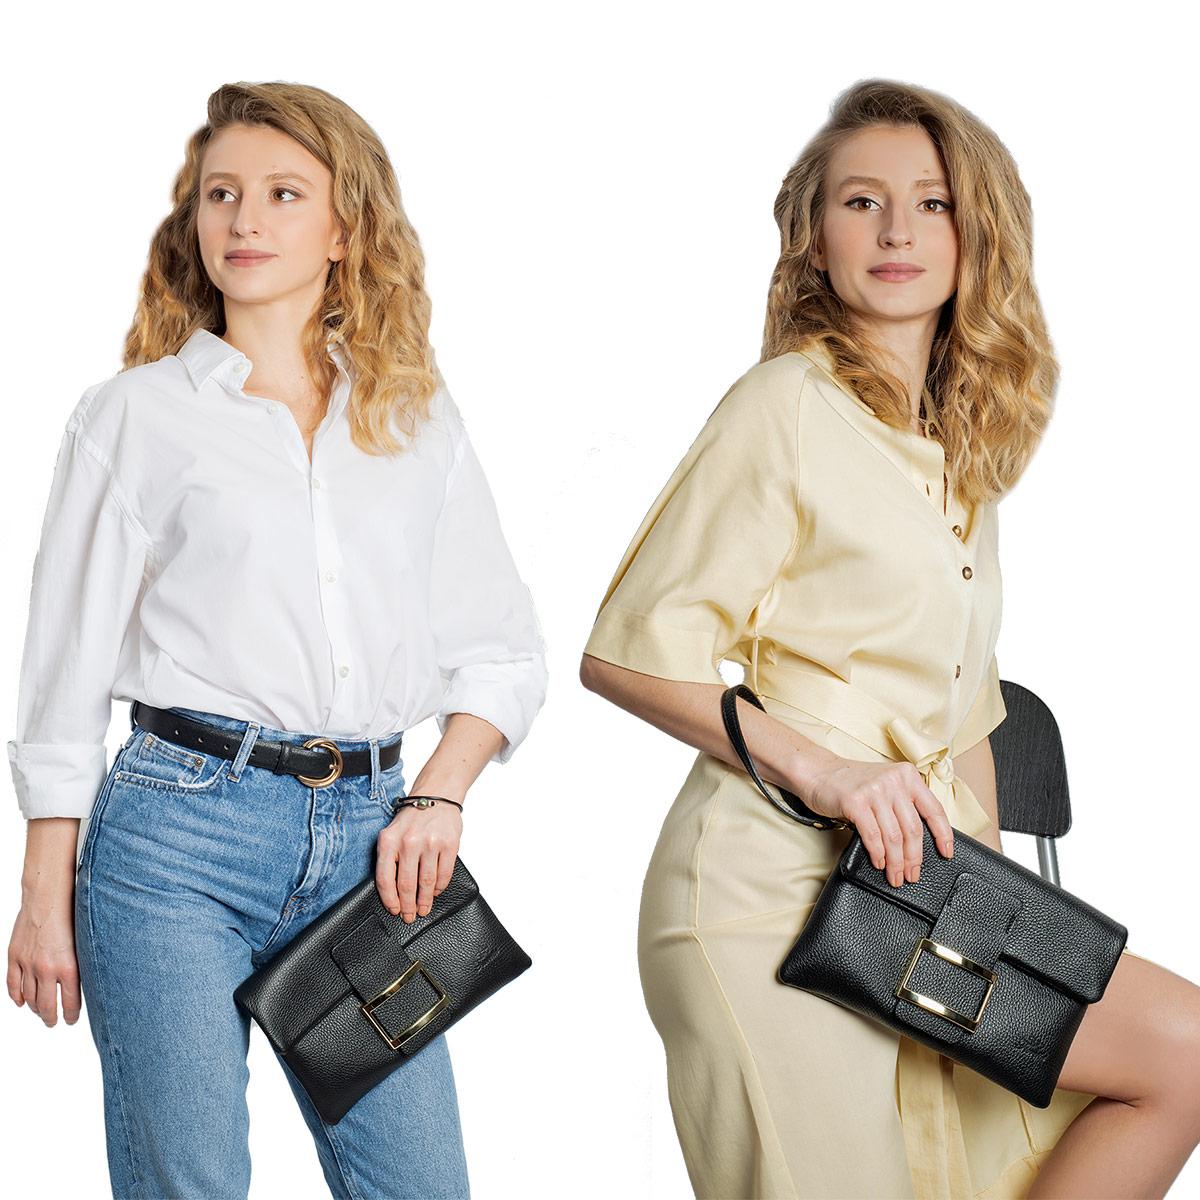 Fioretta Italian Genuine Leather Wristlet Crossbody Shoulder Bag Clutch Handbag For Women - Black